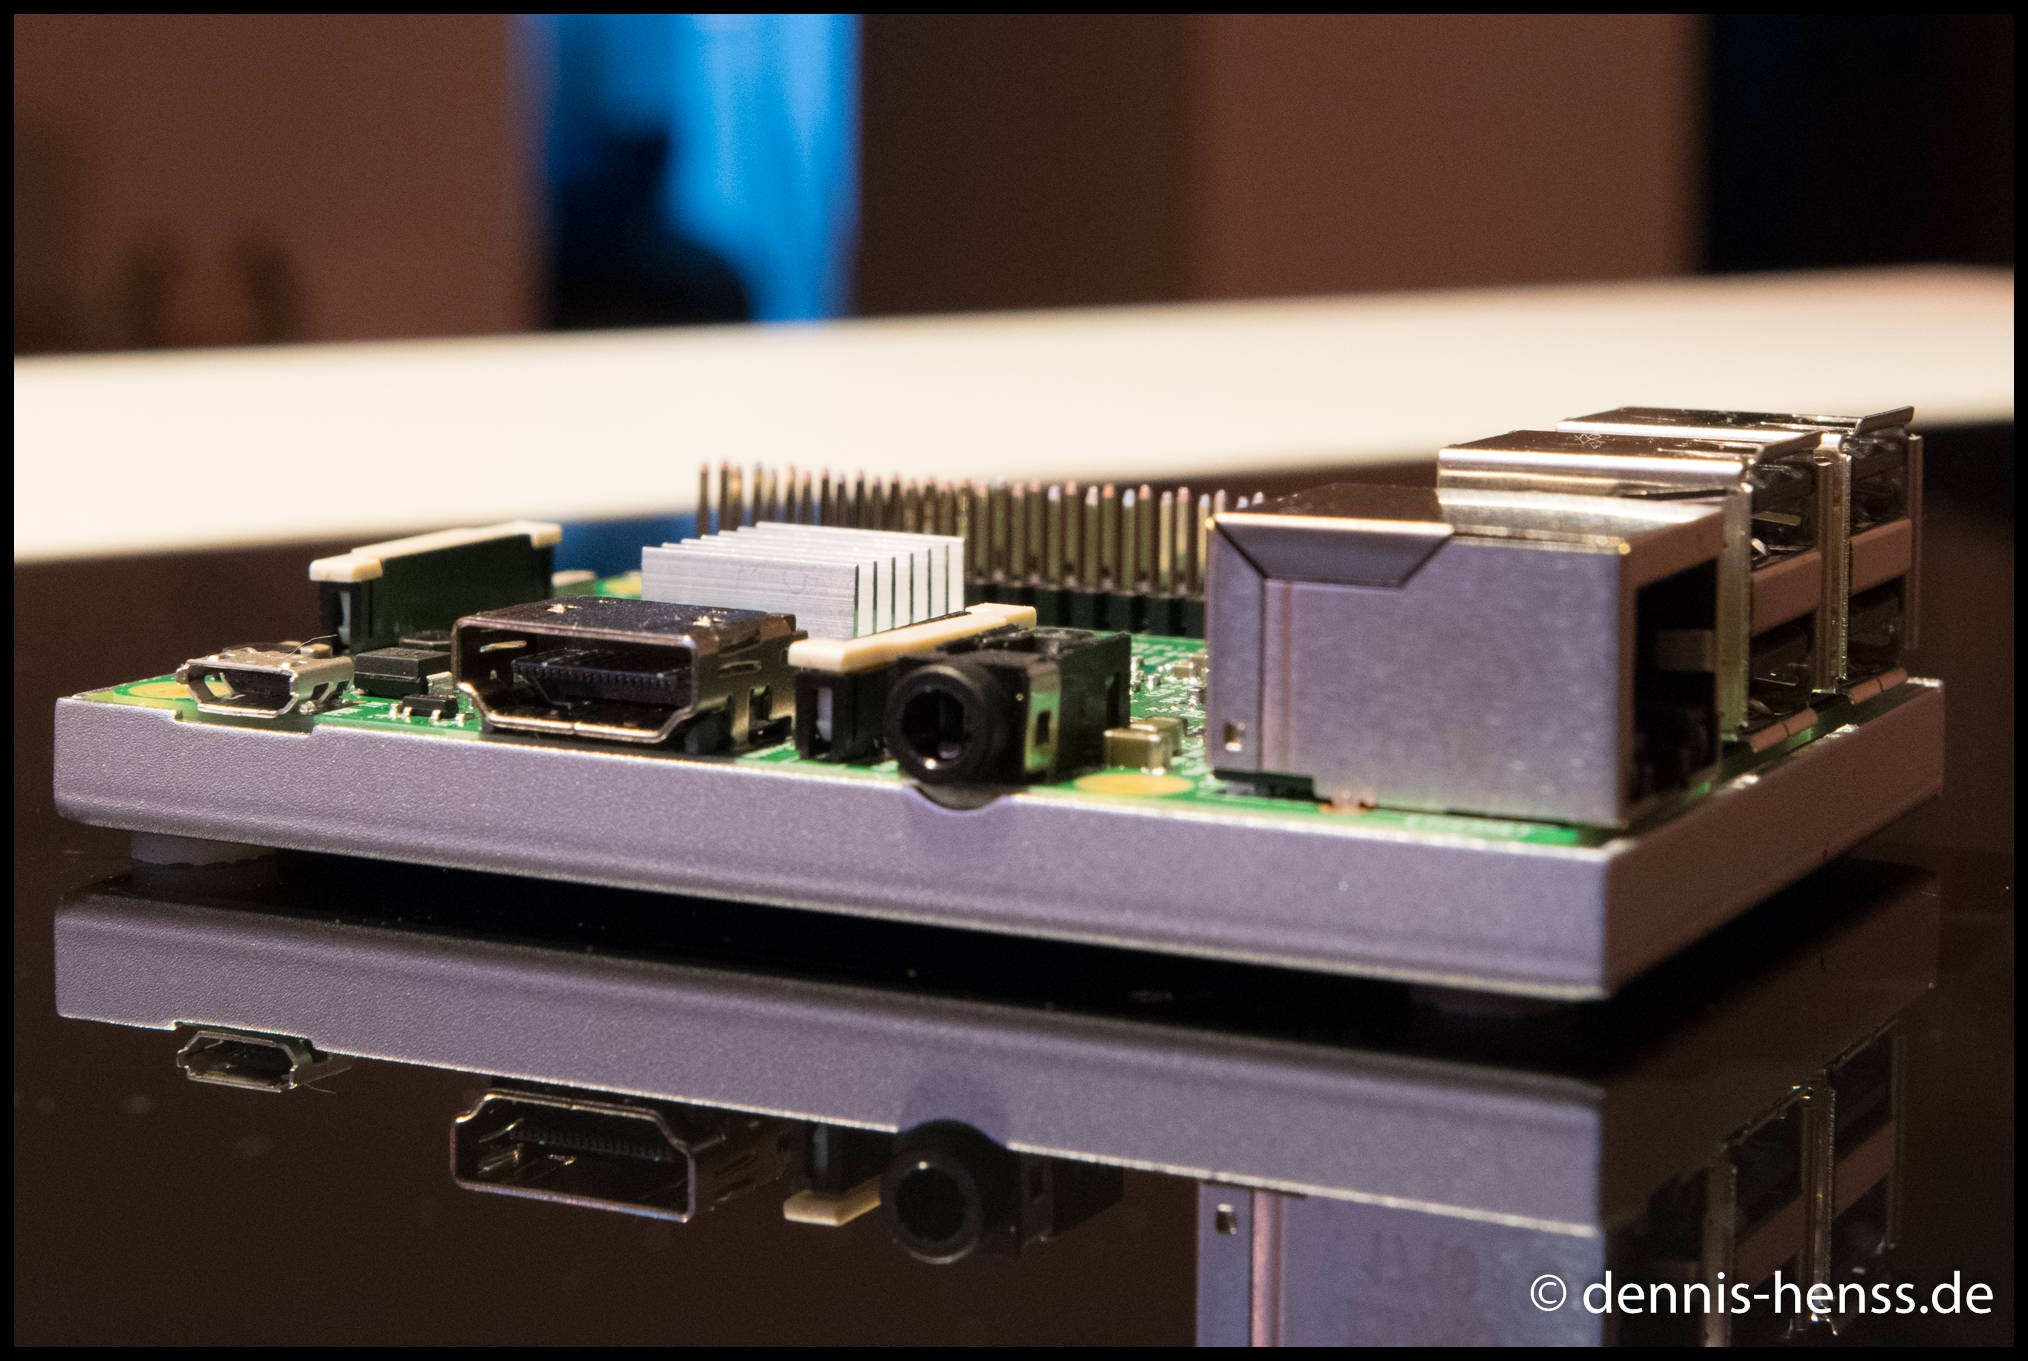 Der Raspberry Pi 3 mit Micro-USB (Strom), HDMI, Klinke Audio, LAN und 4 x USB